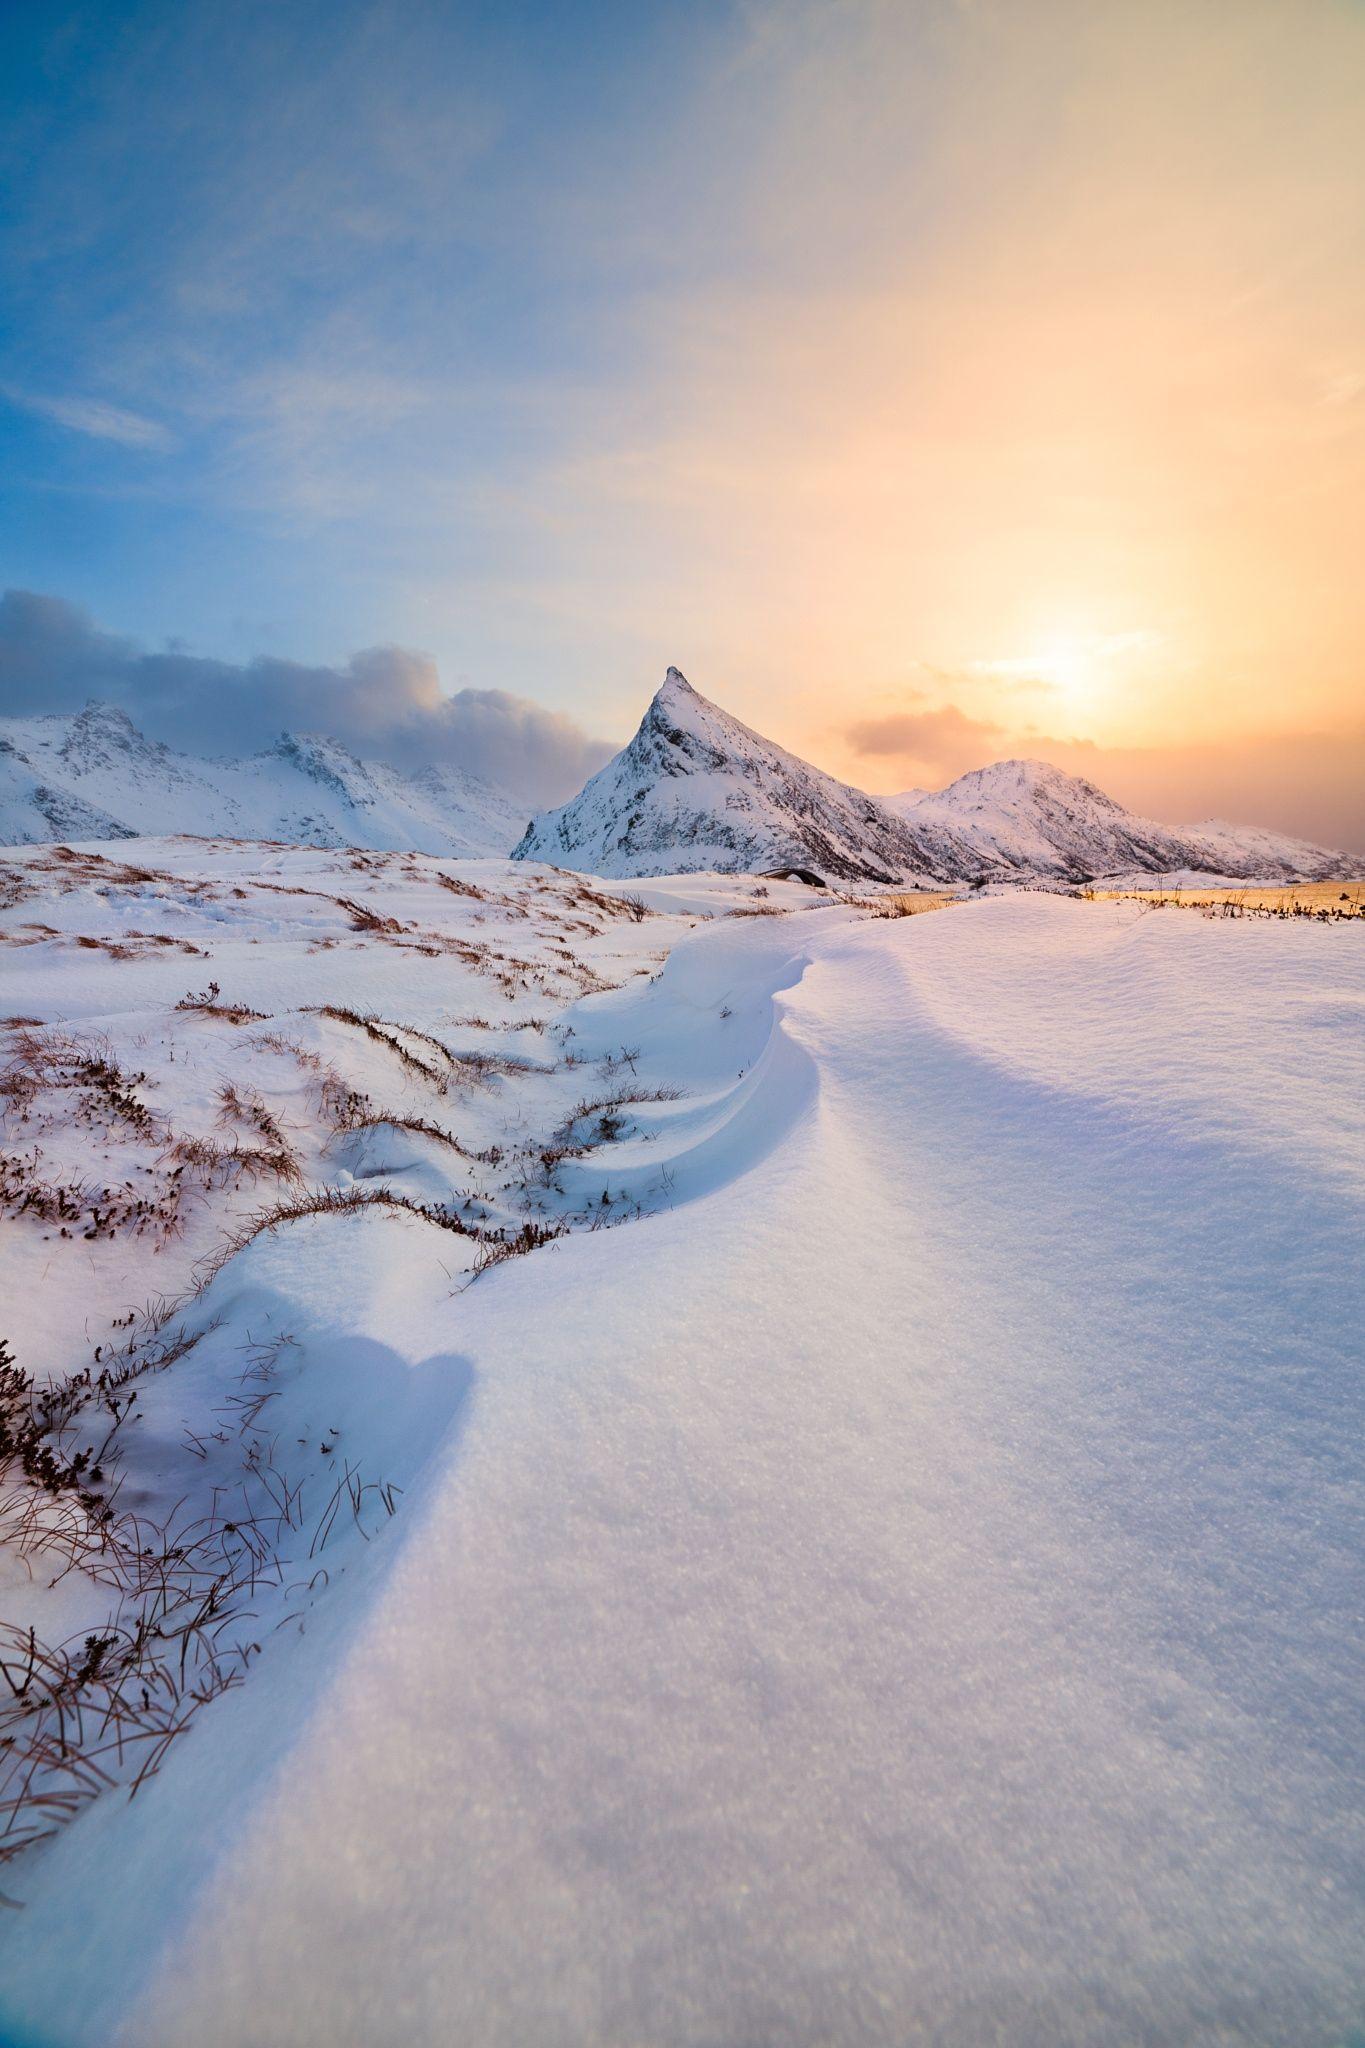 Beautiful Winter Outfit Www Pinterest Com: Winter Scene #winter Scene #snow Sun Sunset White